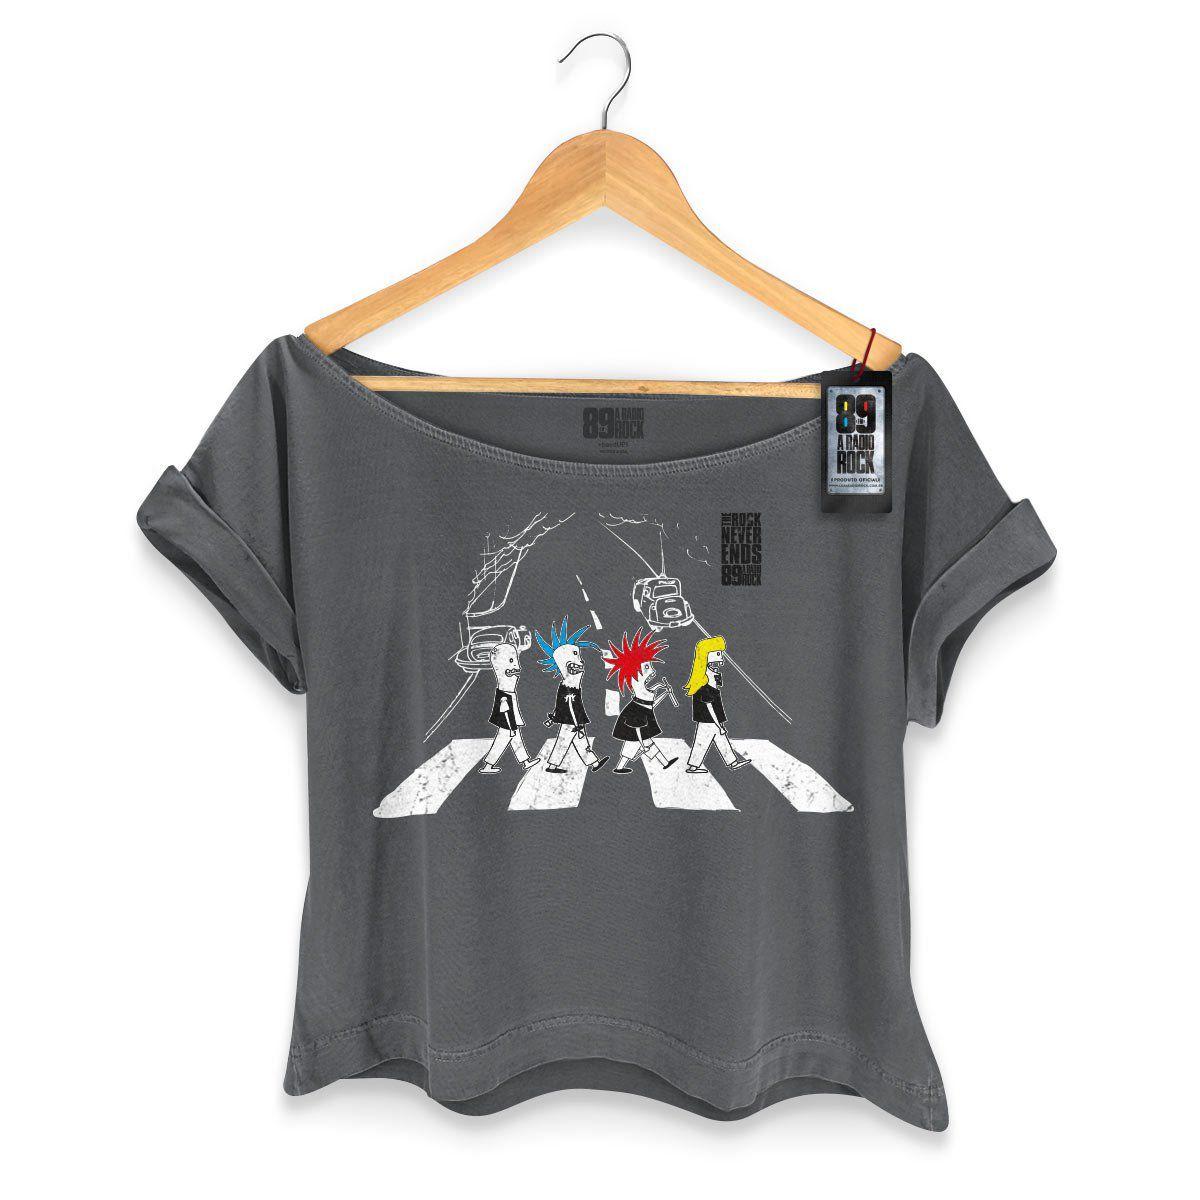 T-shirt Premium Feminina 89FM The Beatles Never Ends  - bandUP Store Marketplace